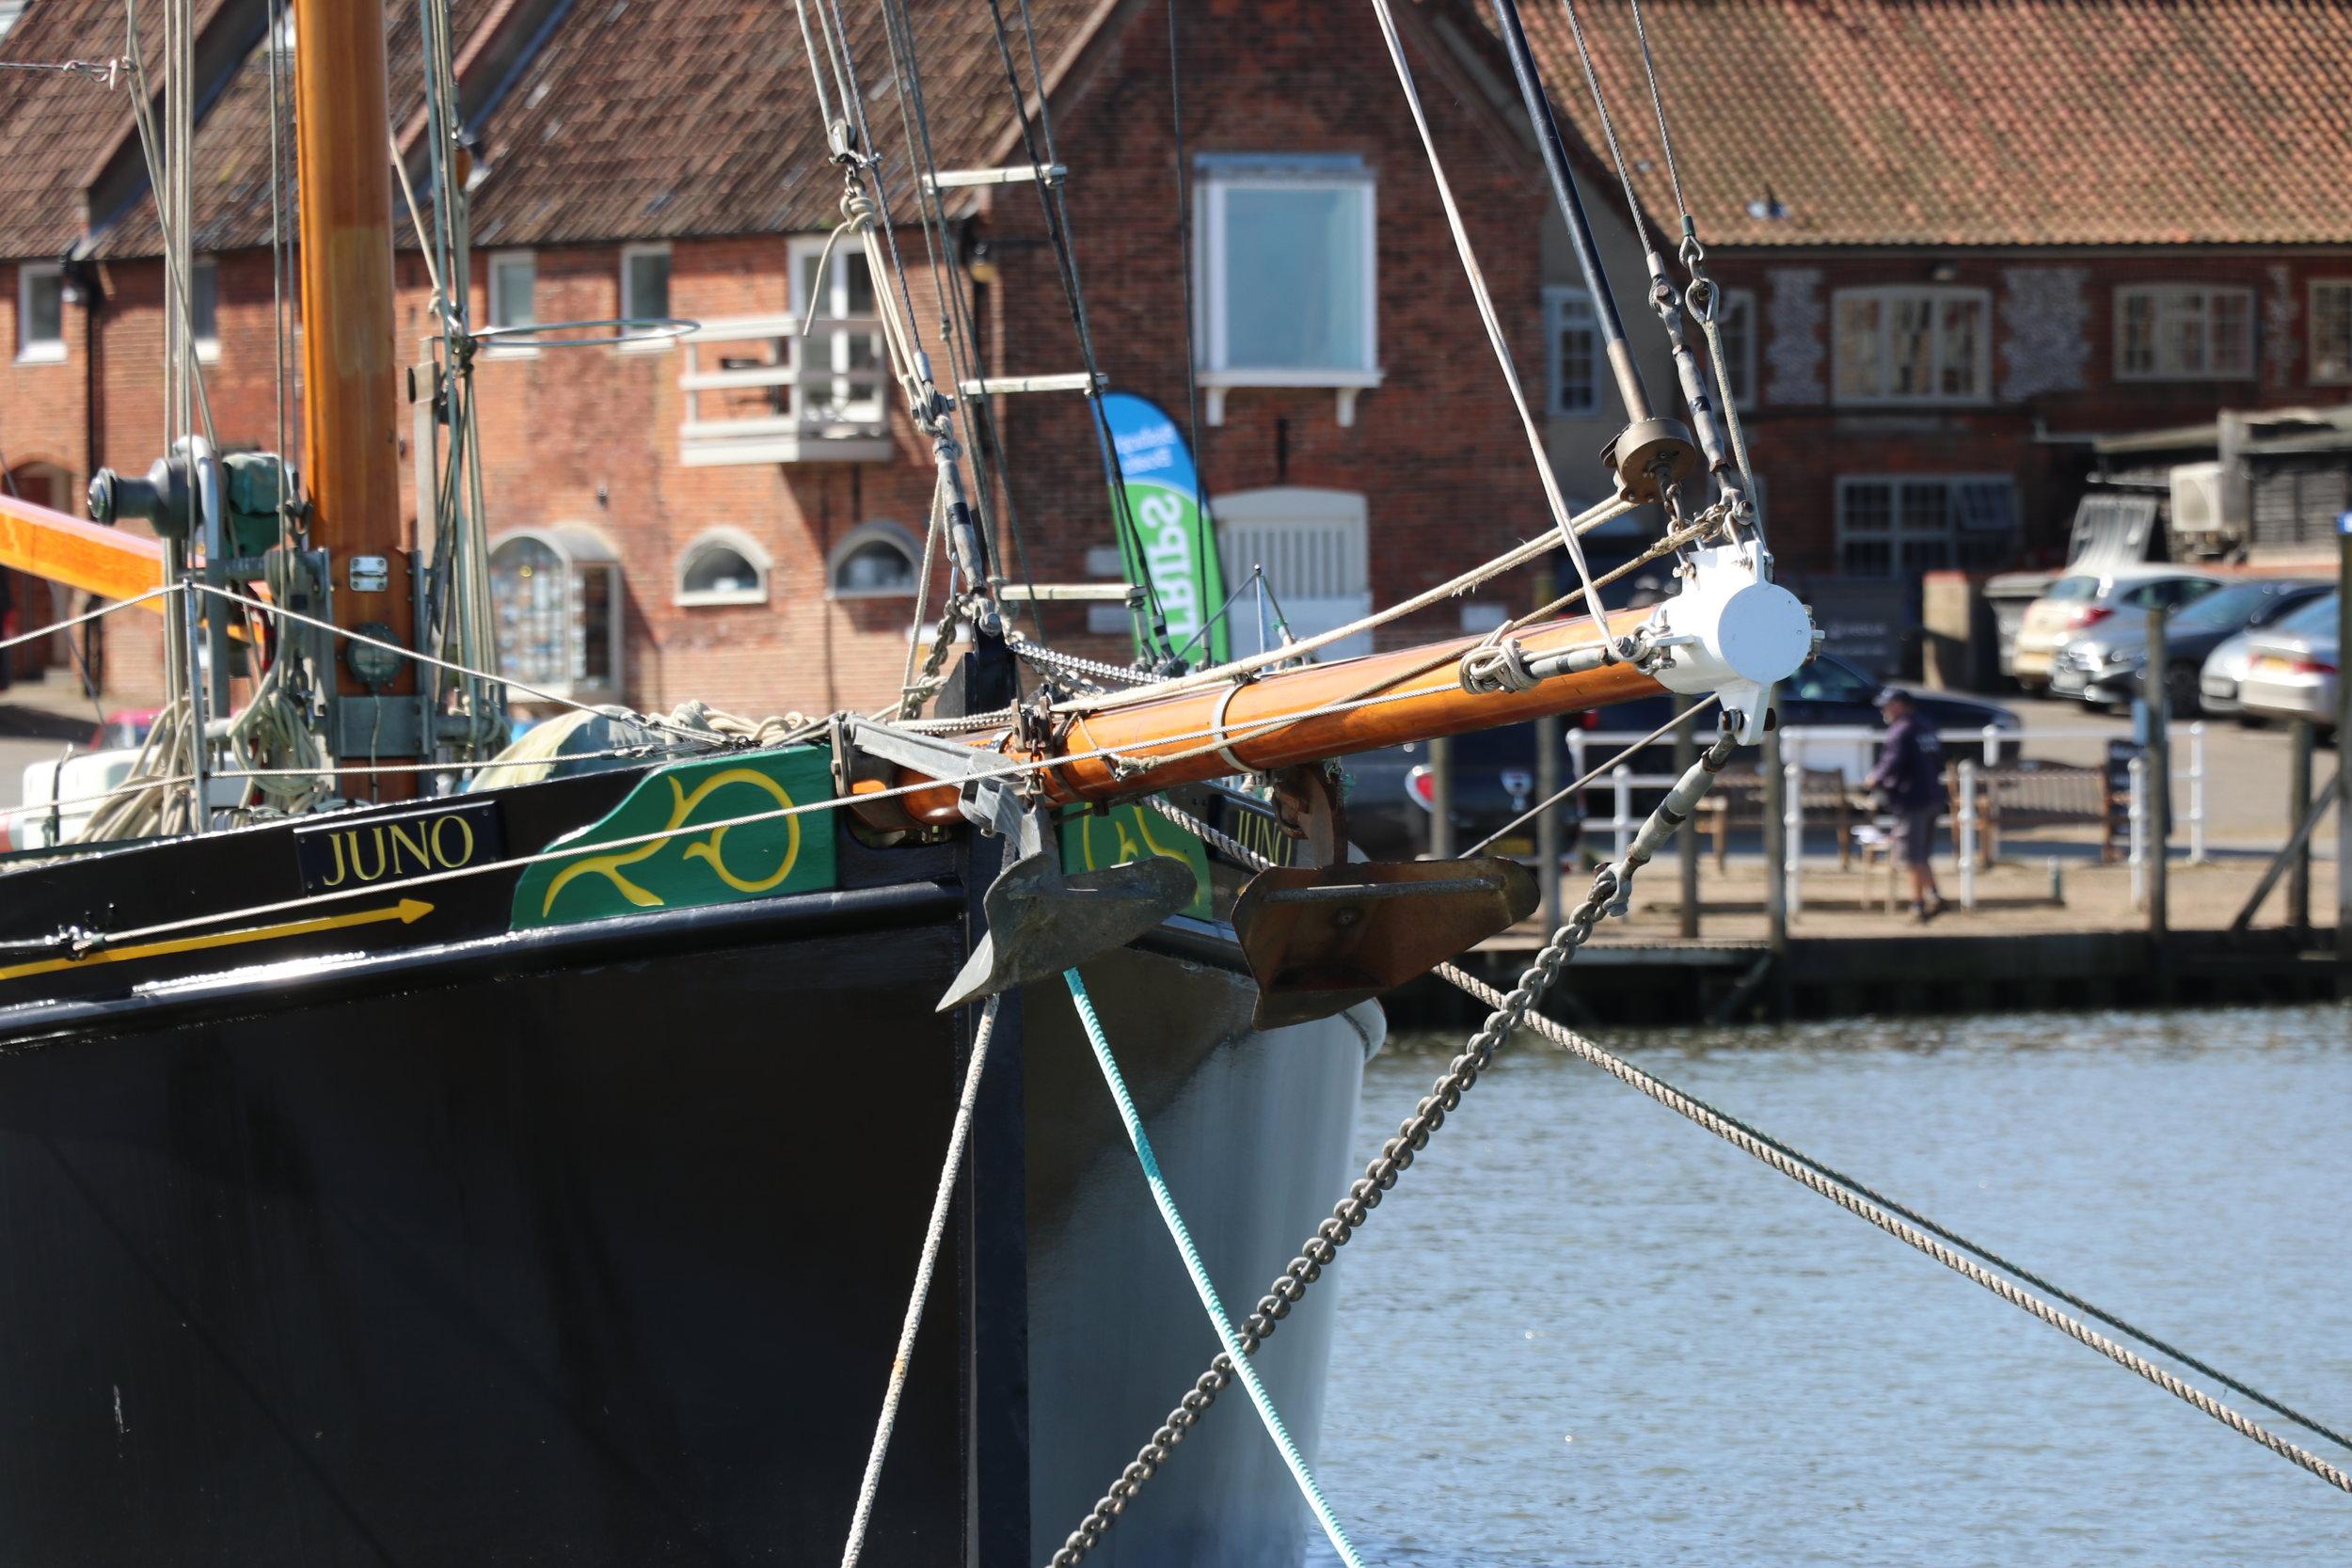 Juno at Blakeney Harbour, May 2018